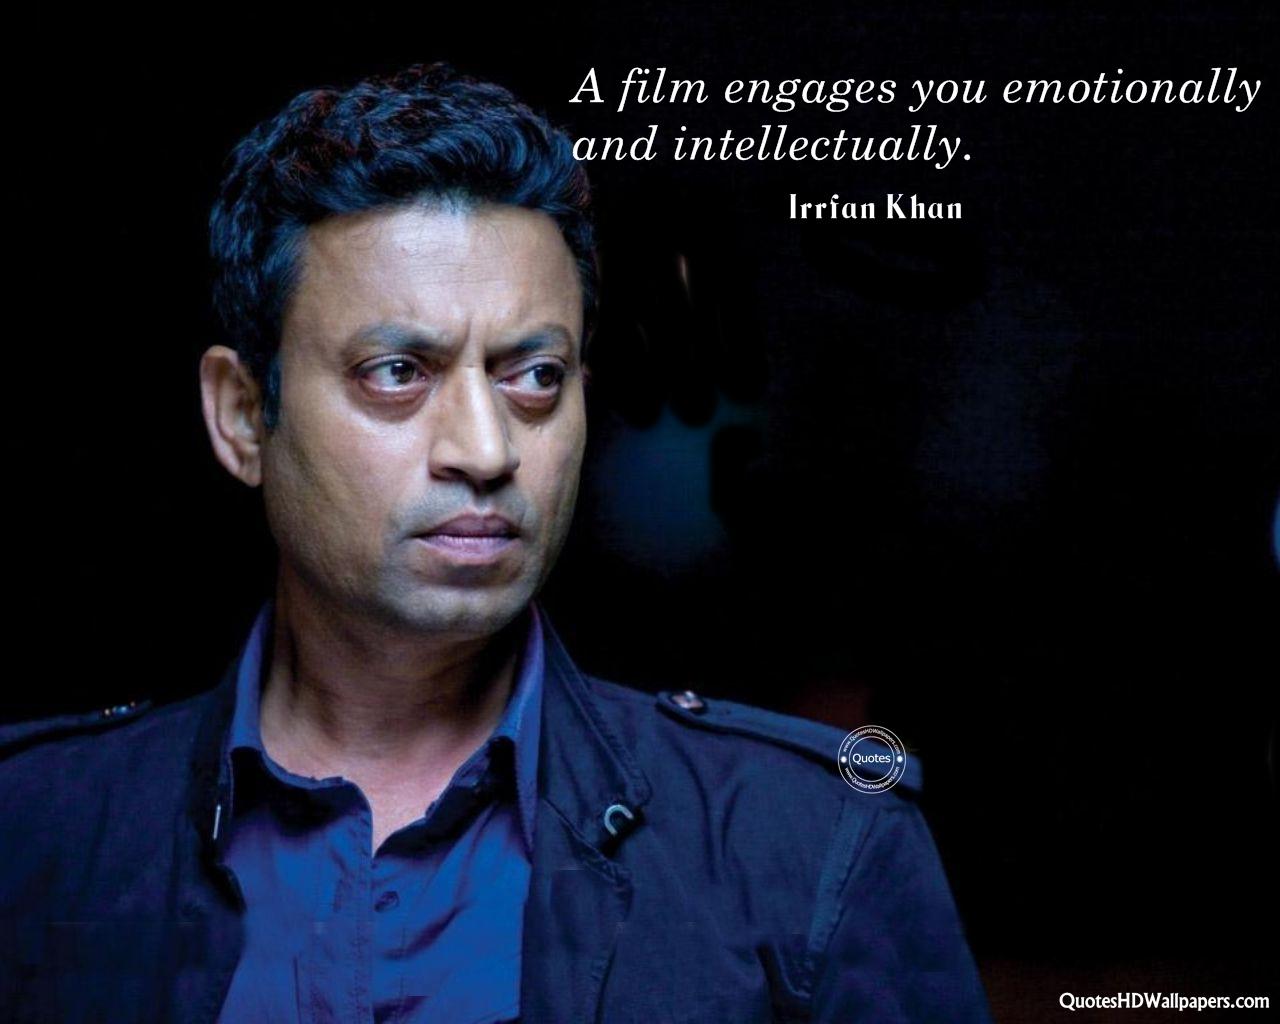 Irrfan Khan's quote #4